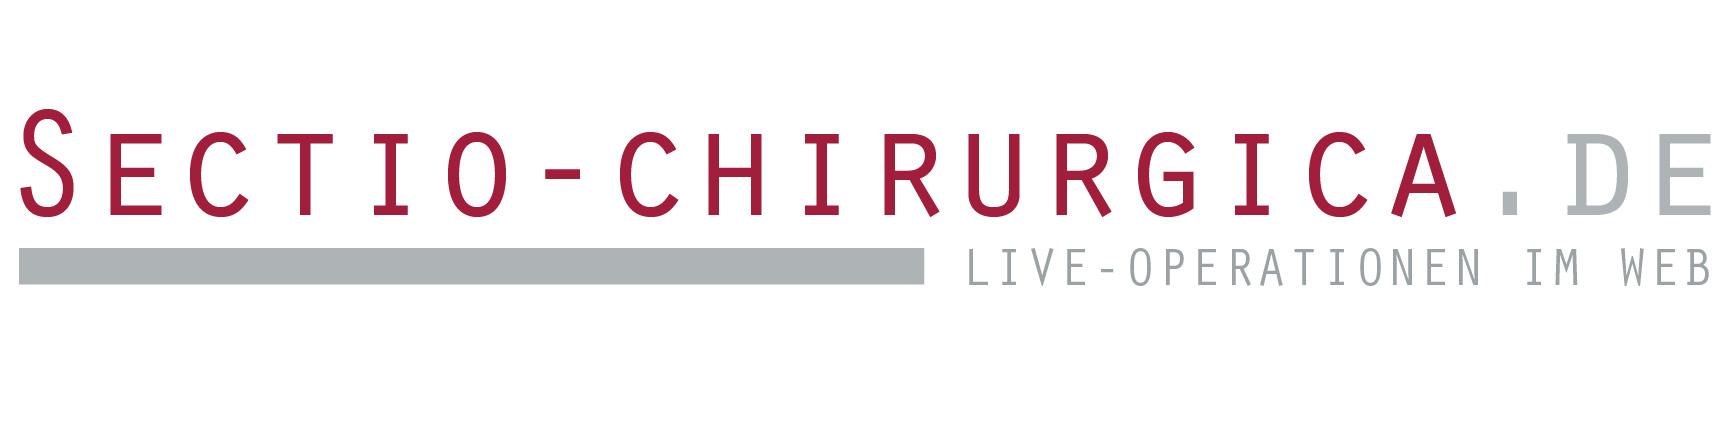 Logo Sectio Chirurgica